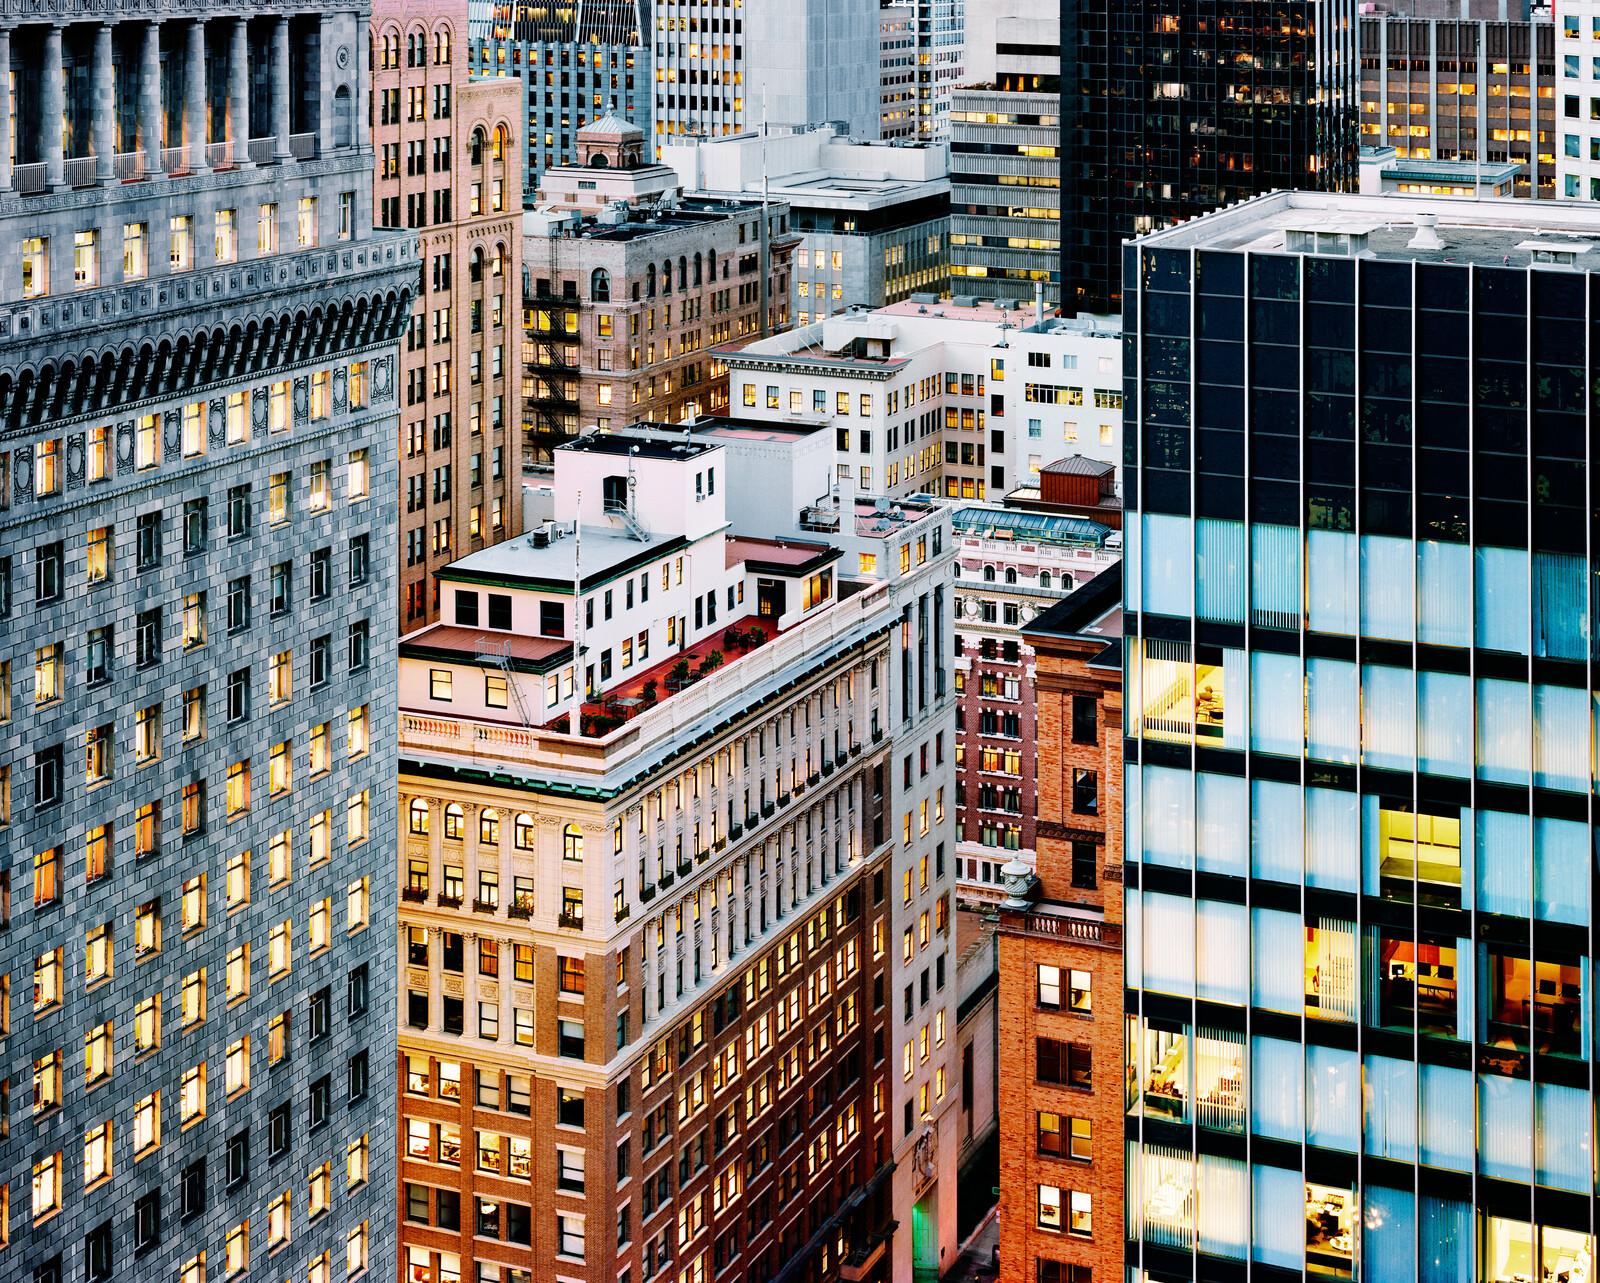 Sutter Street & Sansome Street, San Francisco - Christopher Woodcock